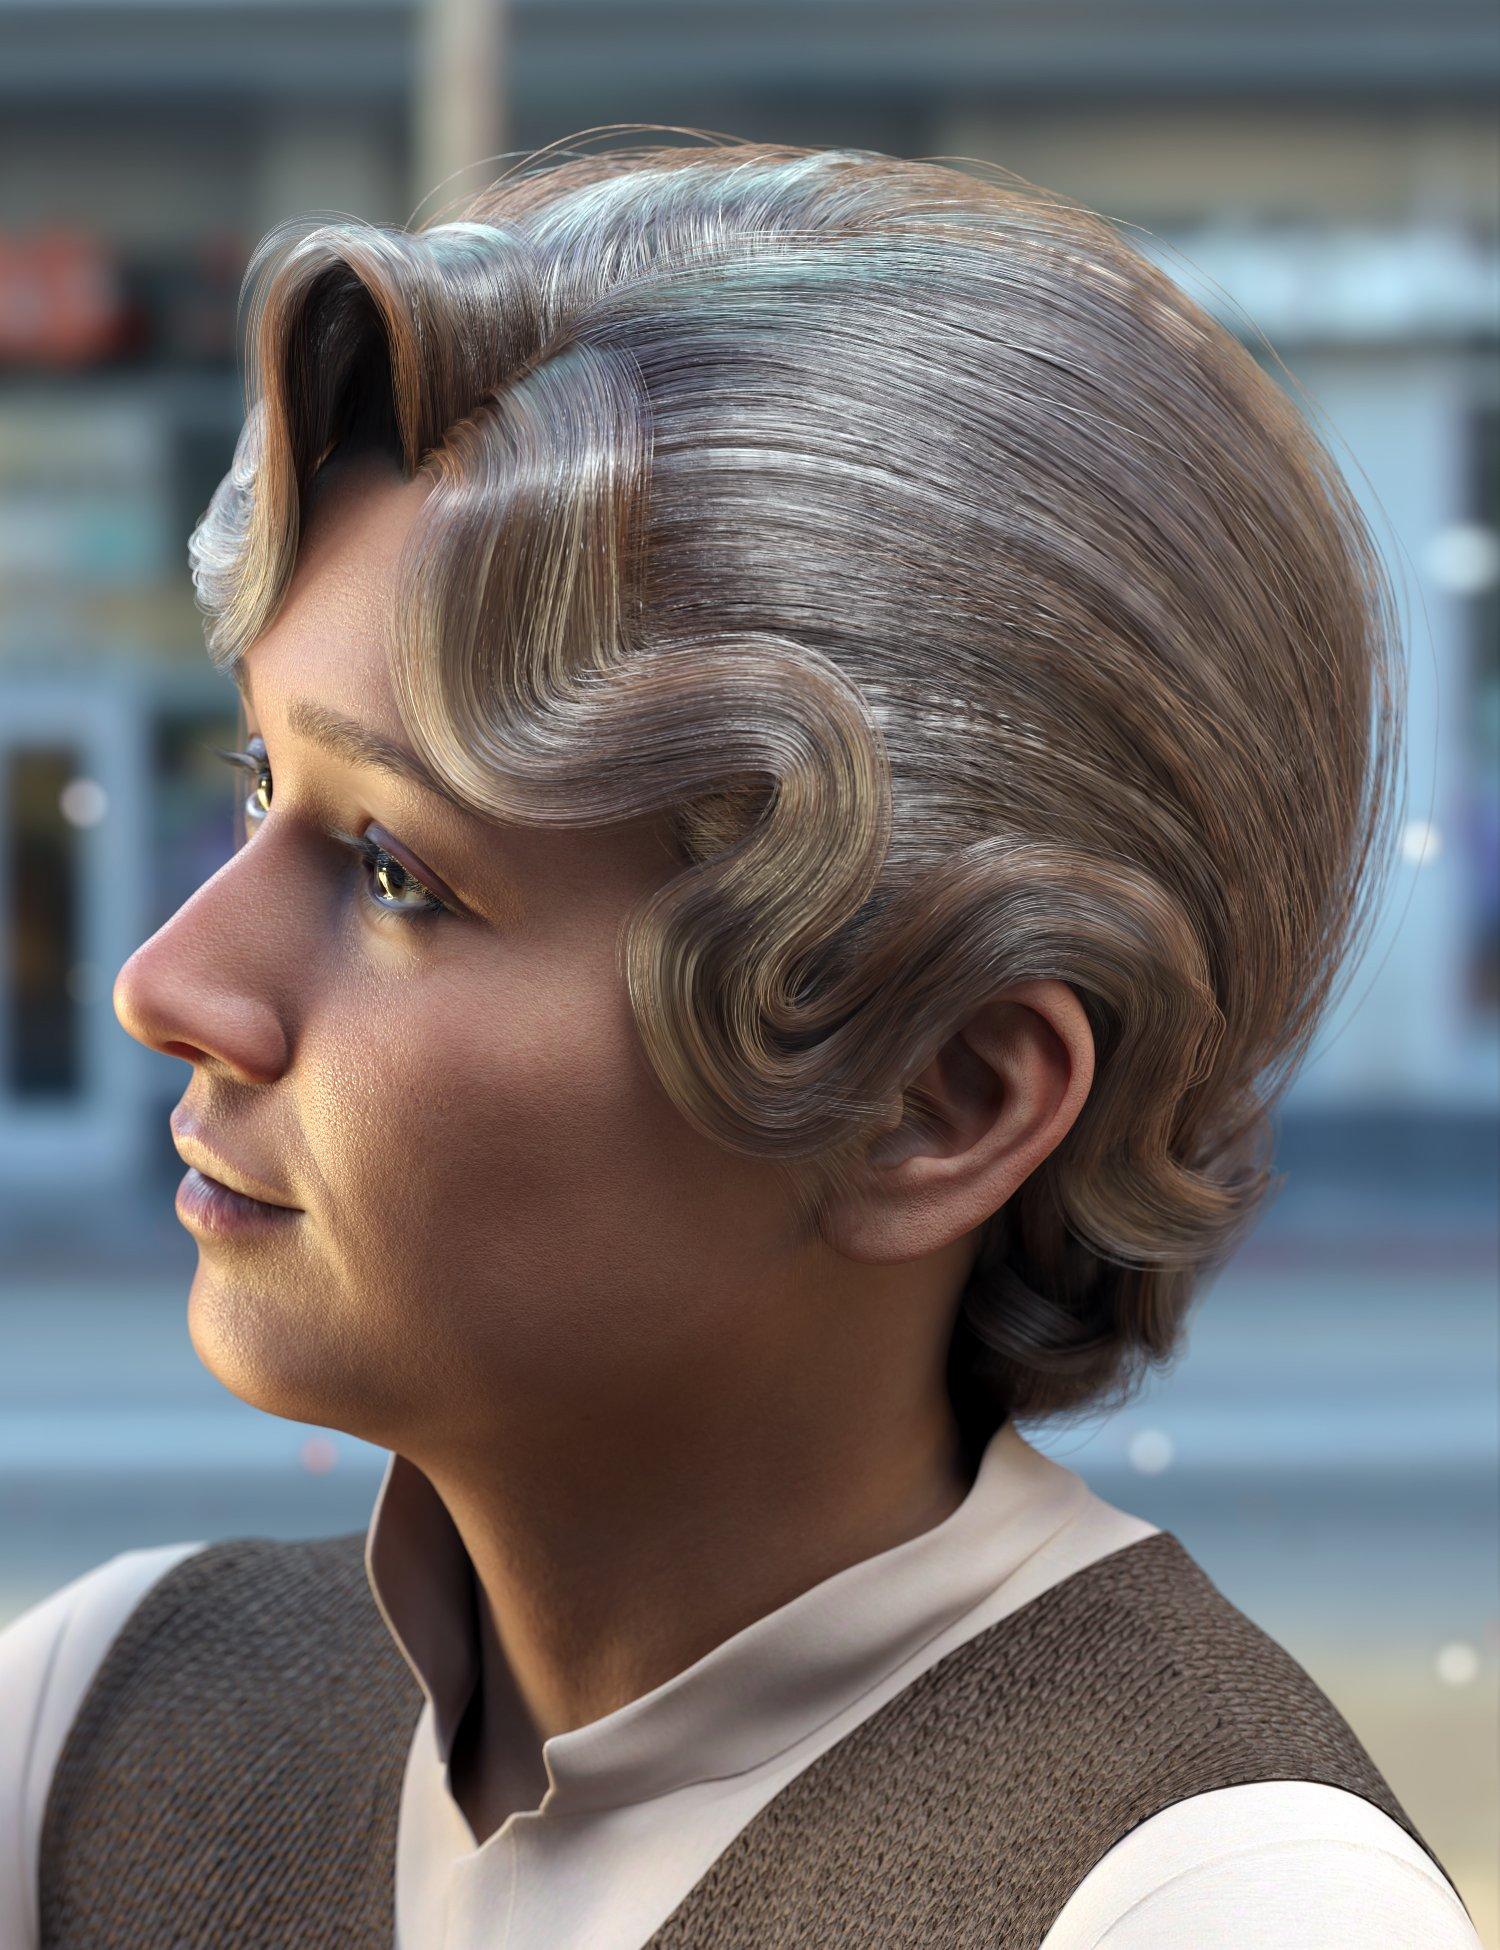 Qun Hair for Genesis 8.1 Females by: Ergou, 3D Models by Daz 3D